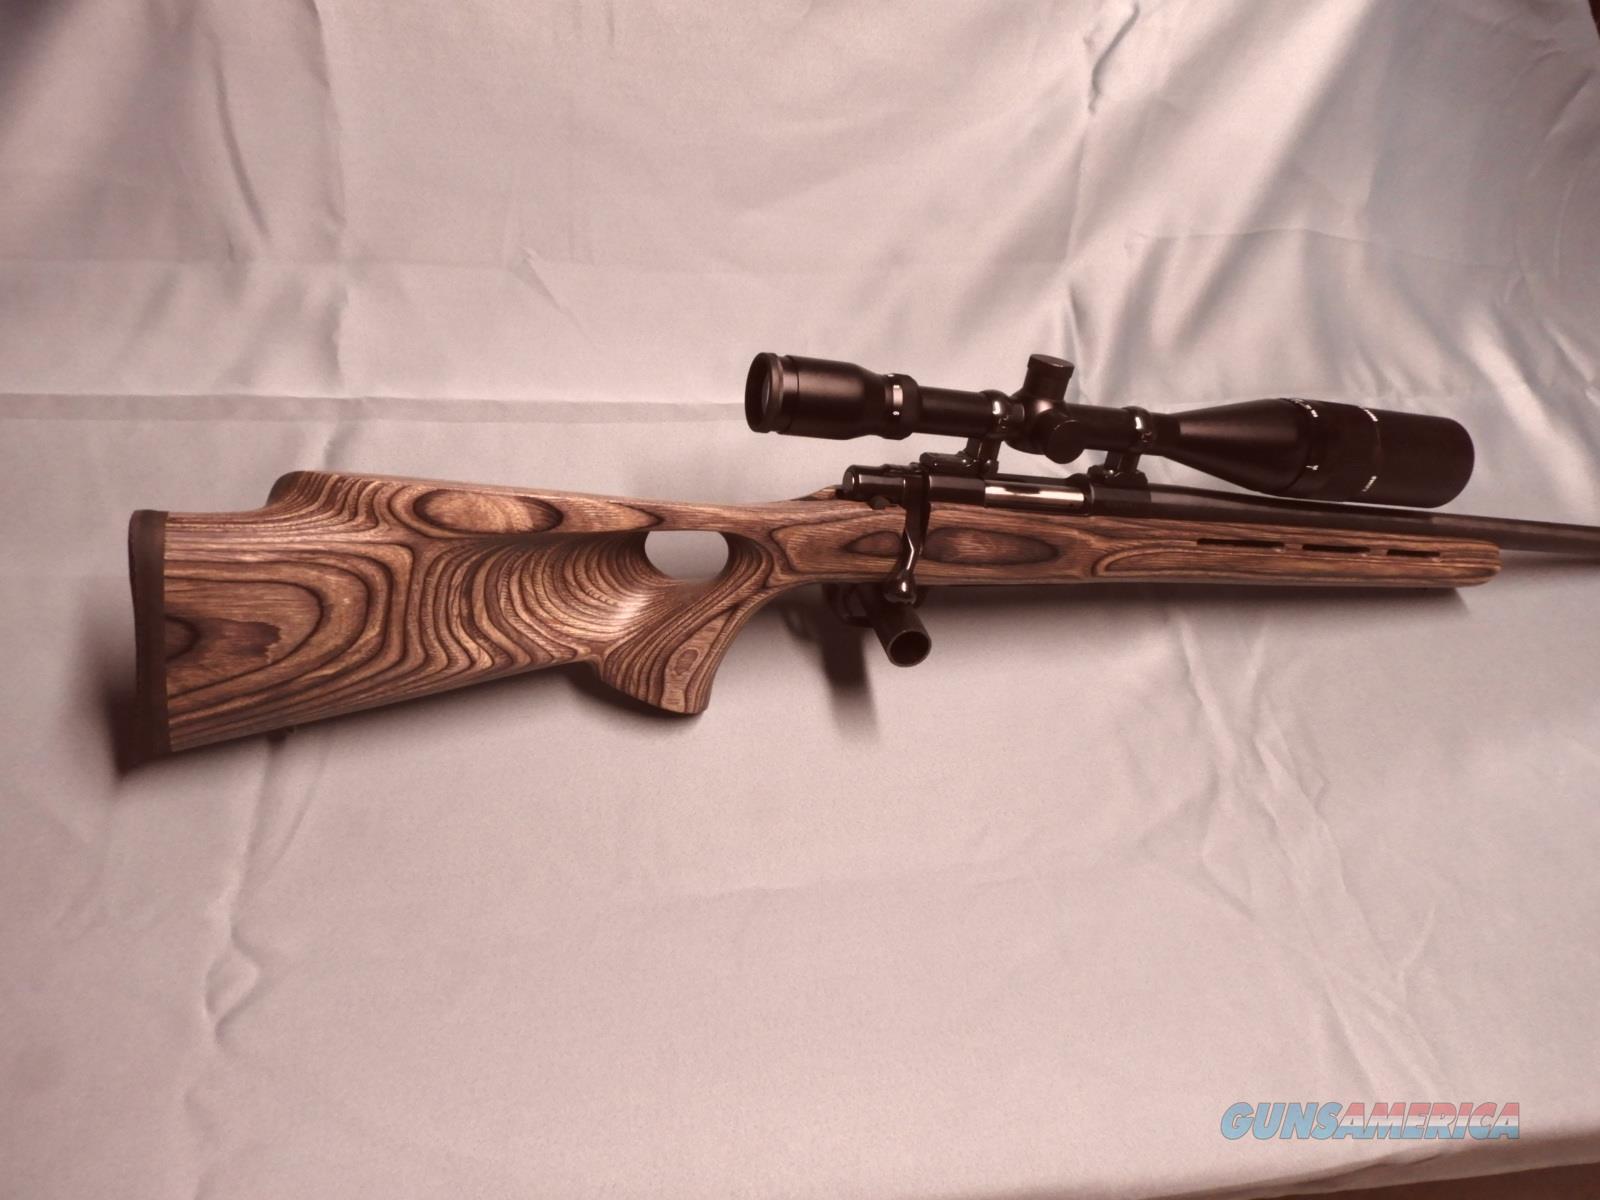 Howa Model 1500  Guns > Rifles > Howa Rifles